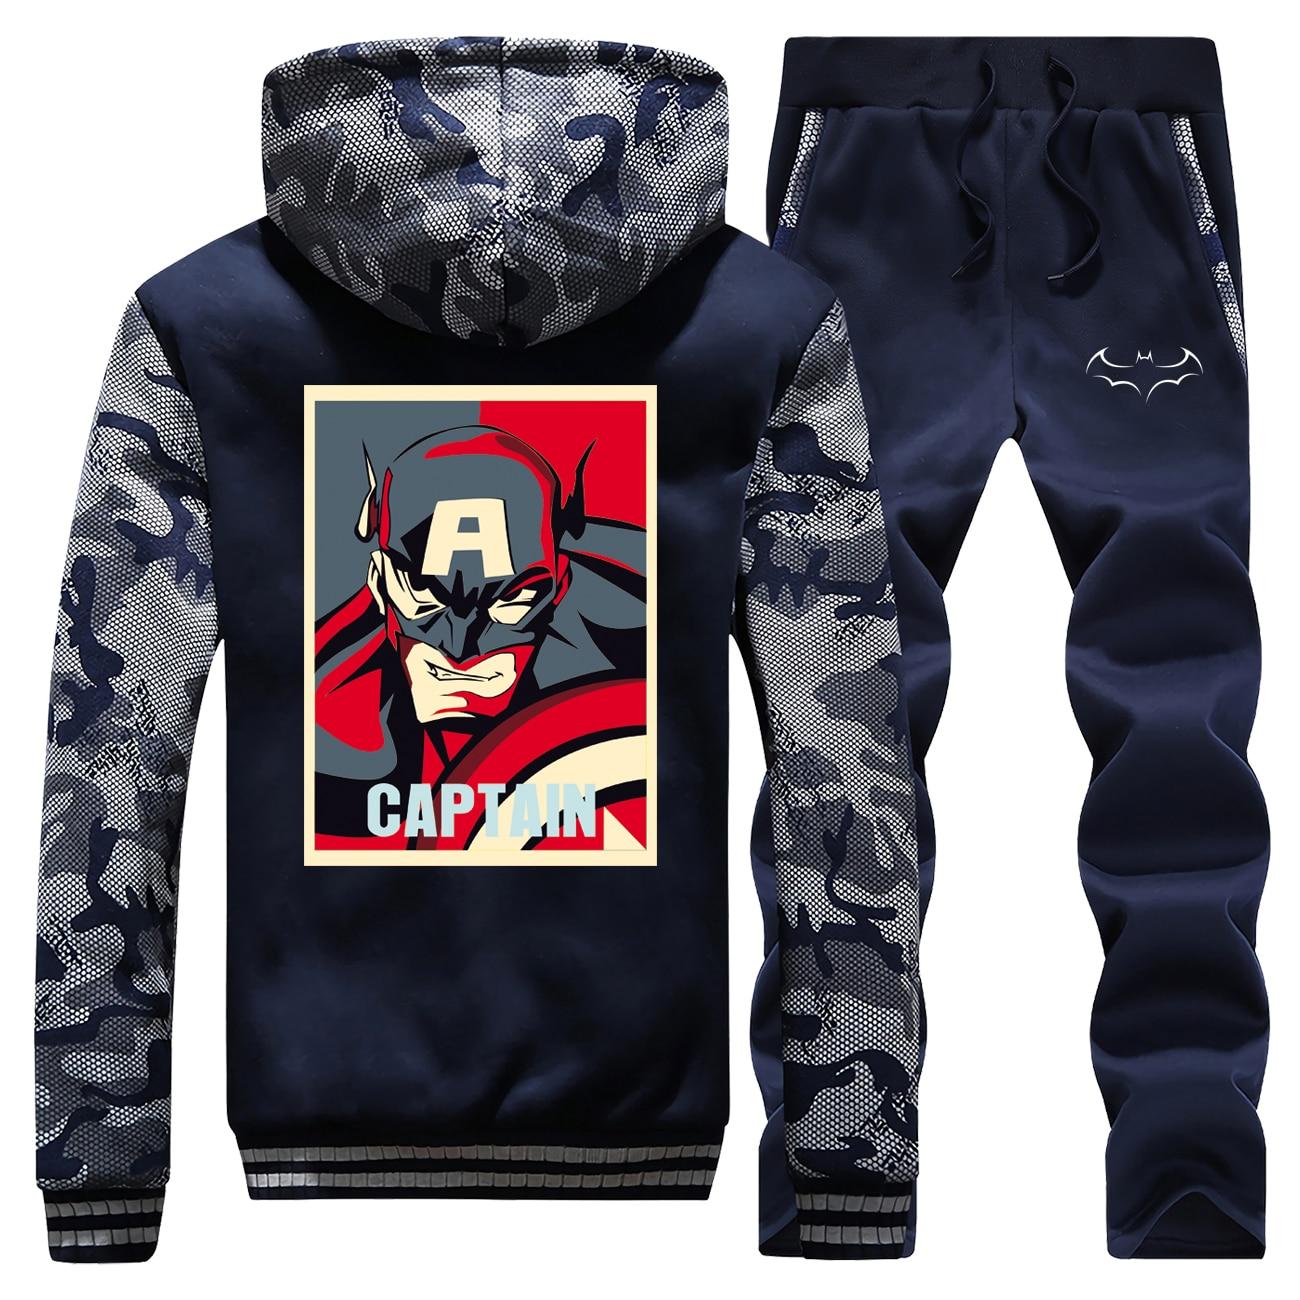 Superhero Batman Tracksuits Jacket Pant Set Men The Dark Knight Bat Man Avengers Sportsuit Sweatpant Suit 2 PCS Coat Sportswear